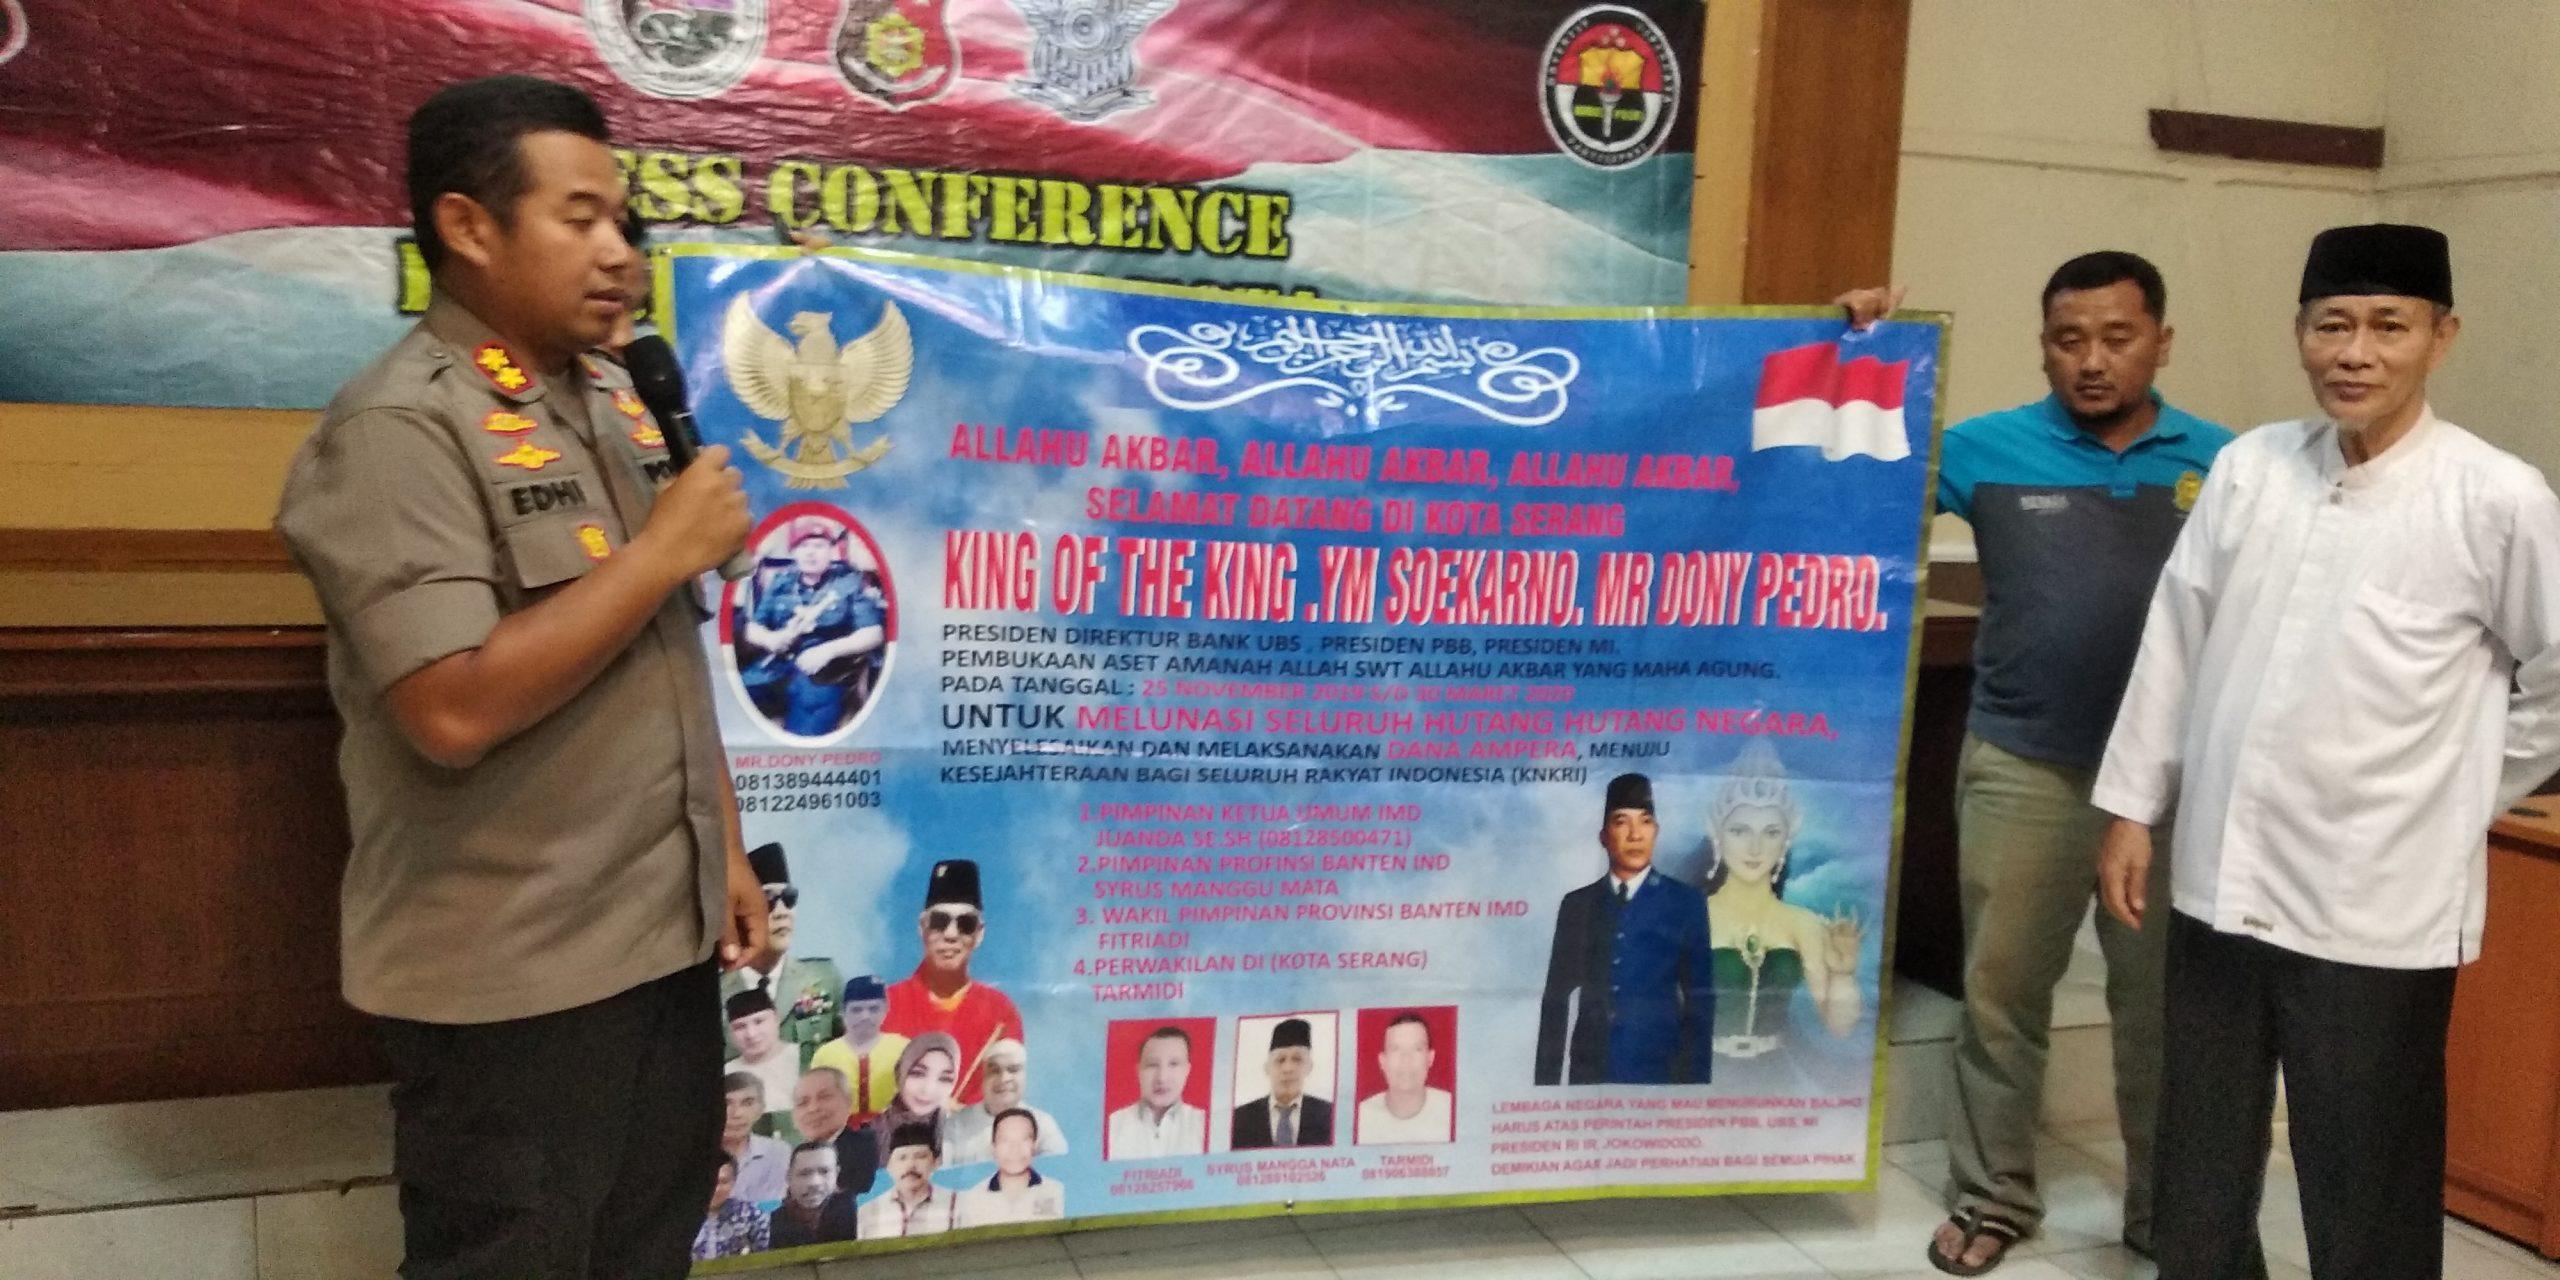 Spanduk King of The King di Banten